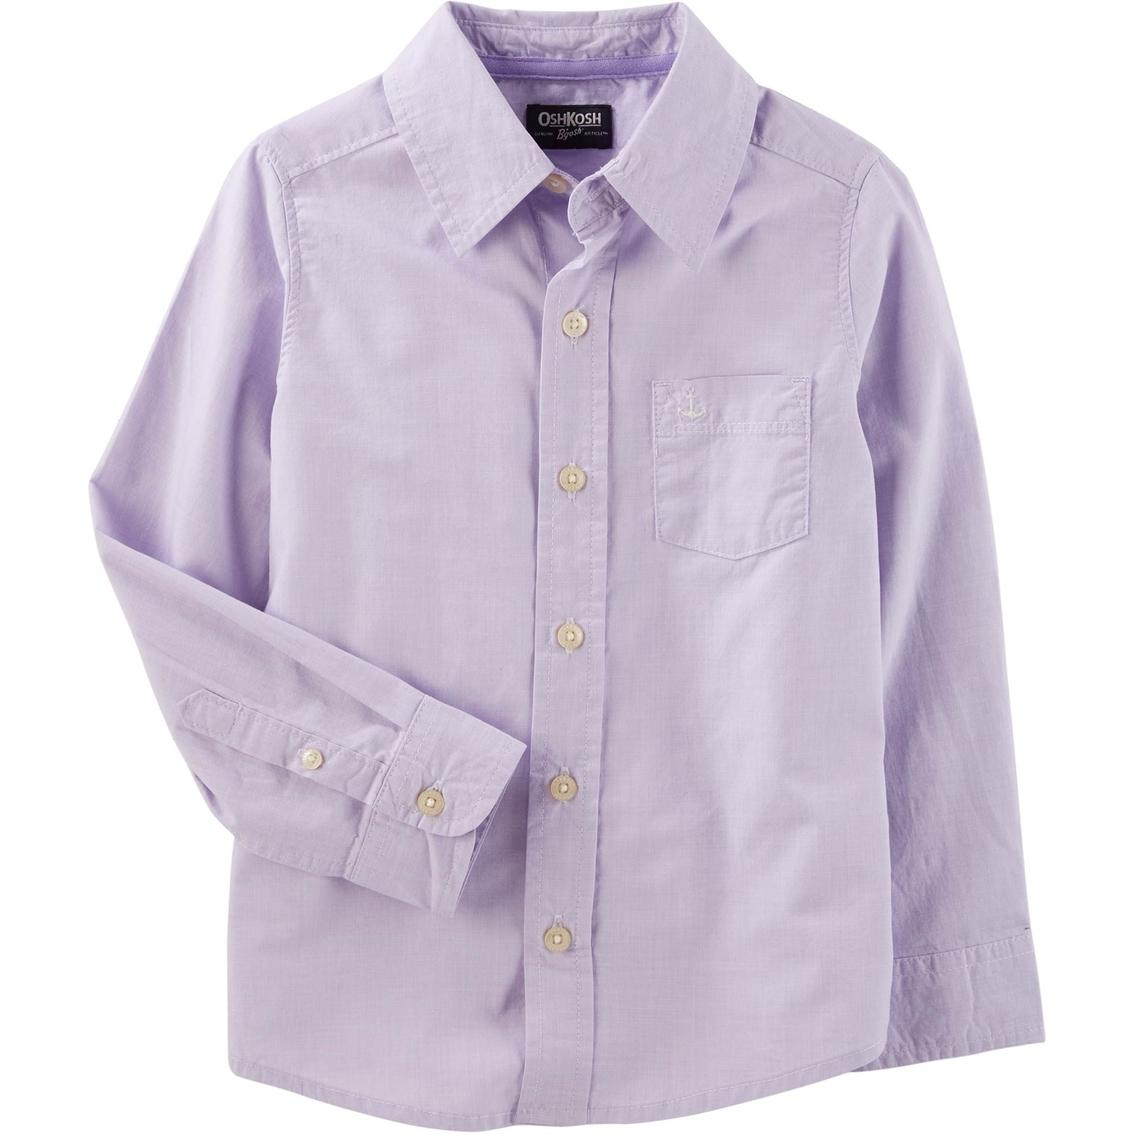 Oshkosh Bgosh Little Boys Woven Button Front Shirt Boys 4 7x